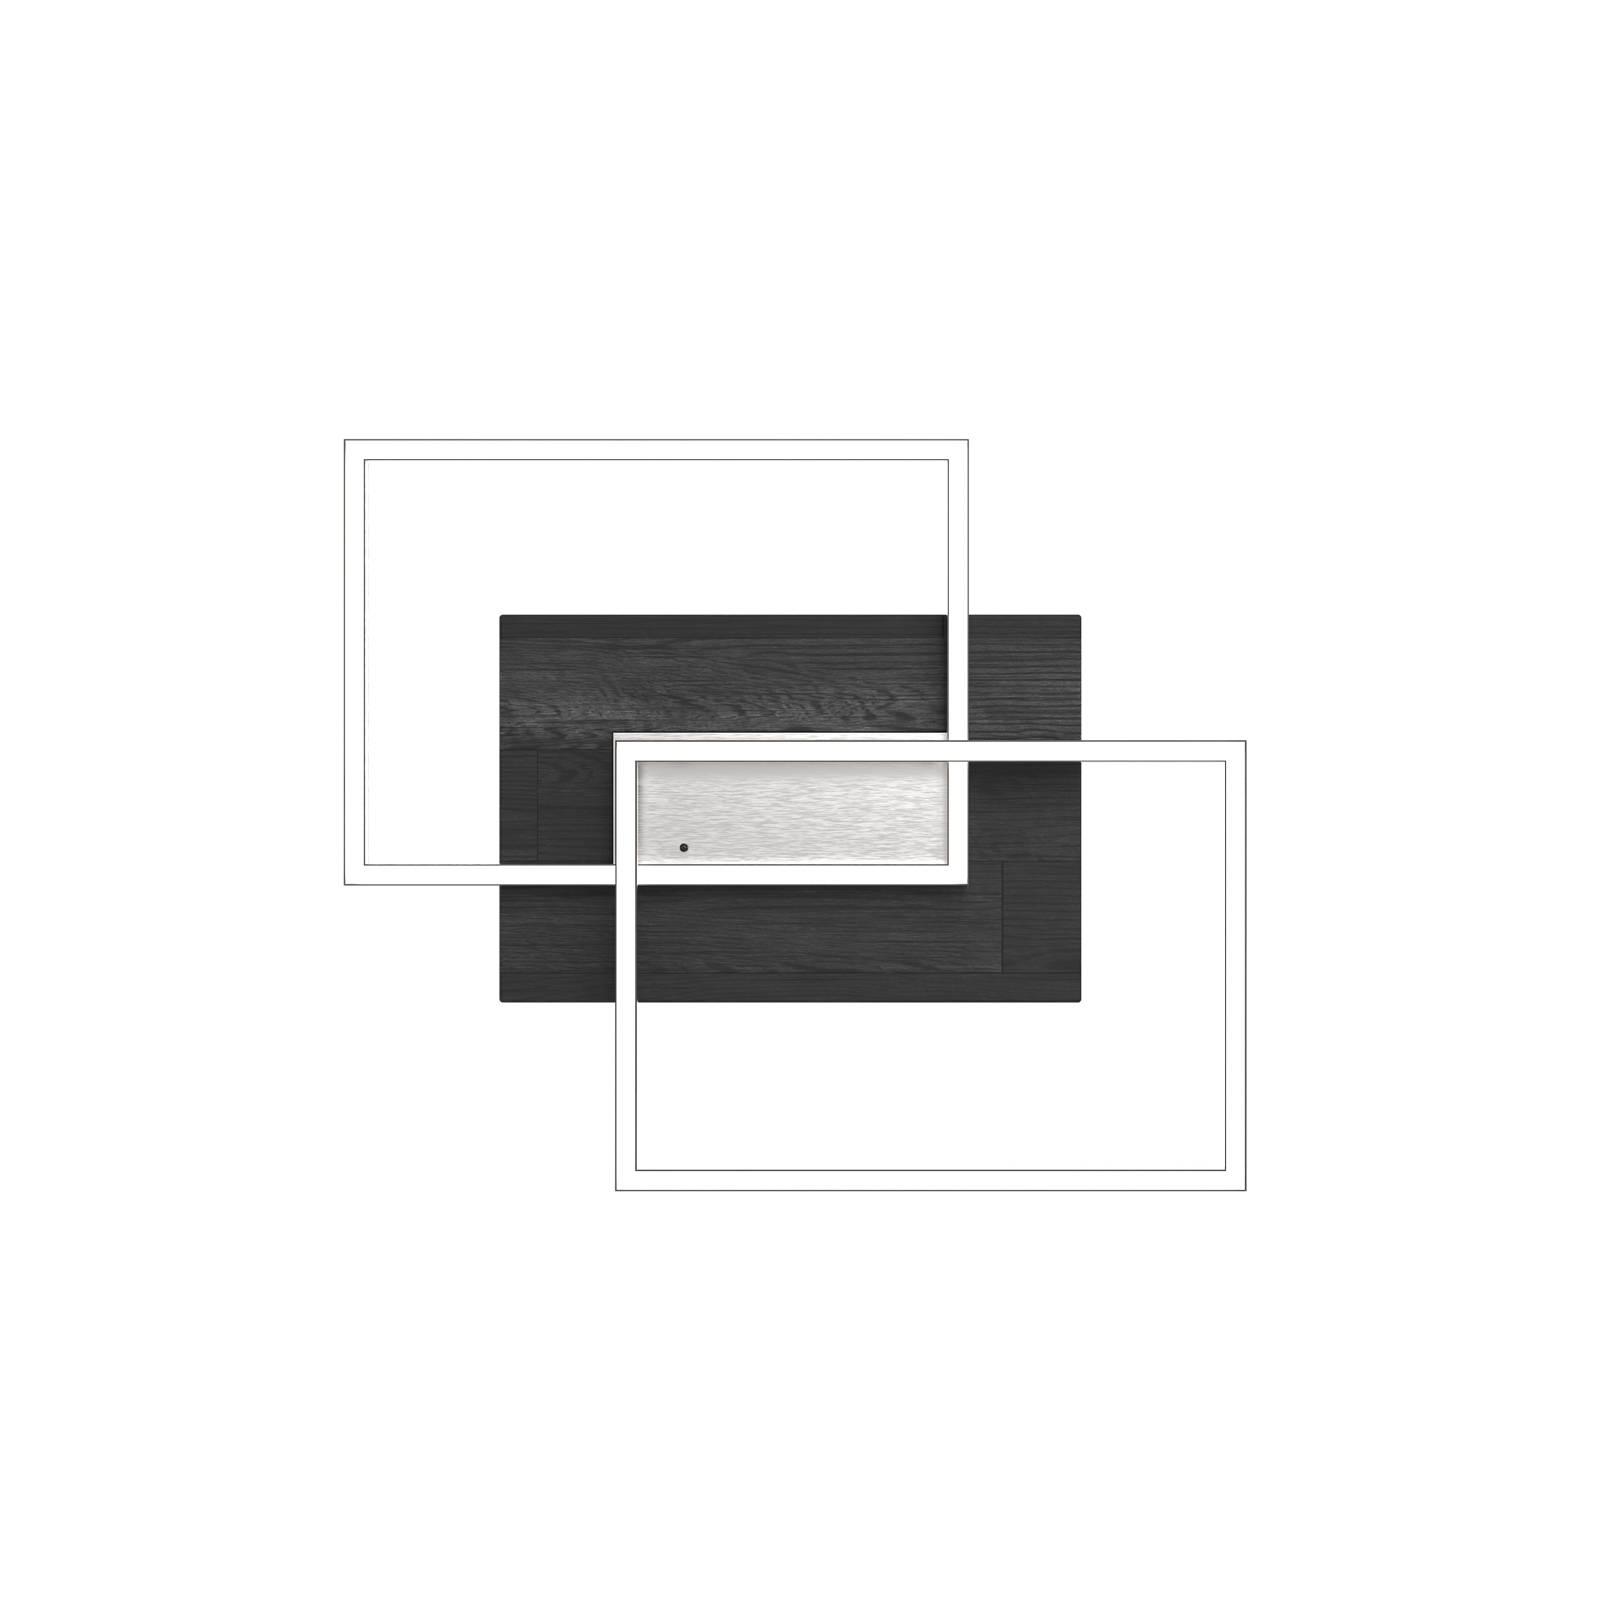 LED-kattovalaisin Panama S, musta tammi